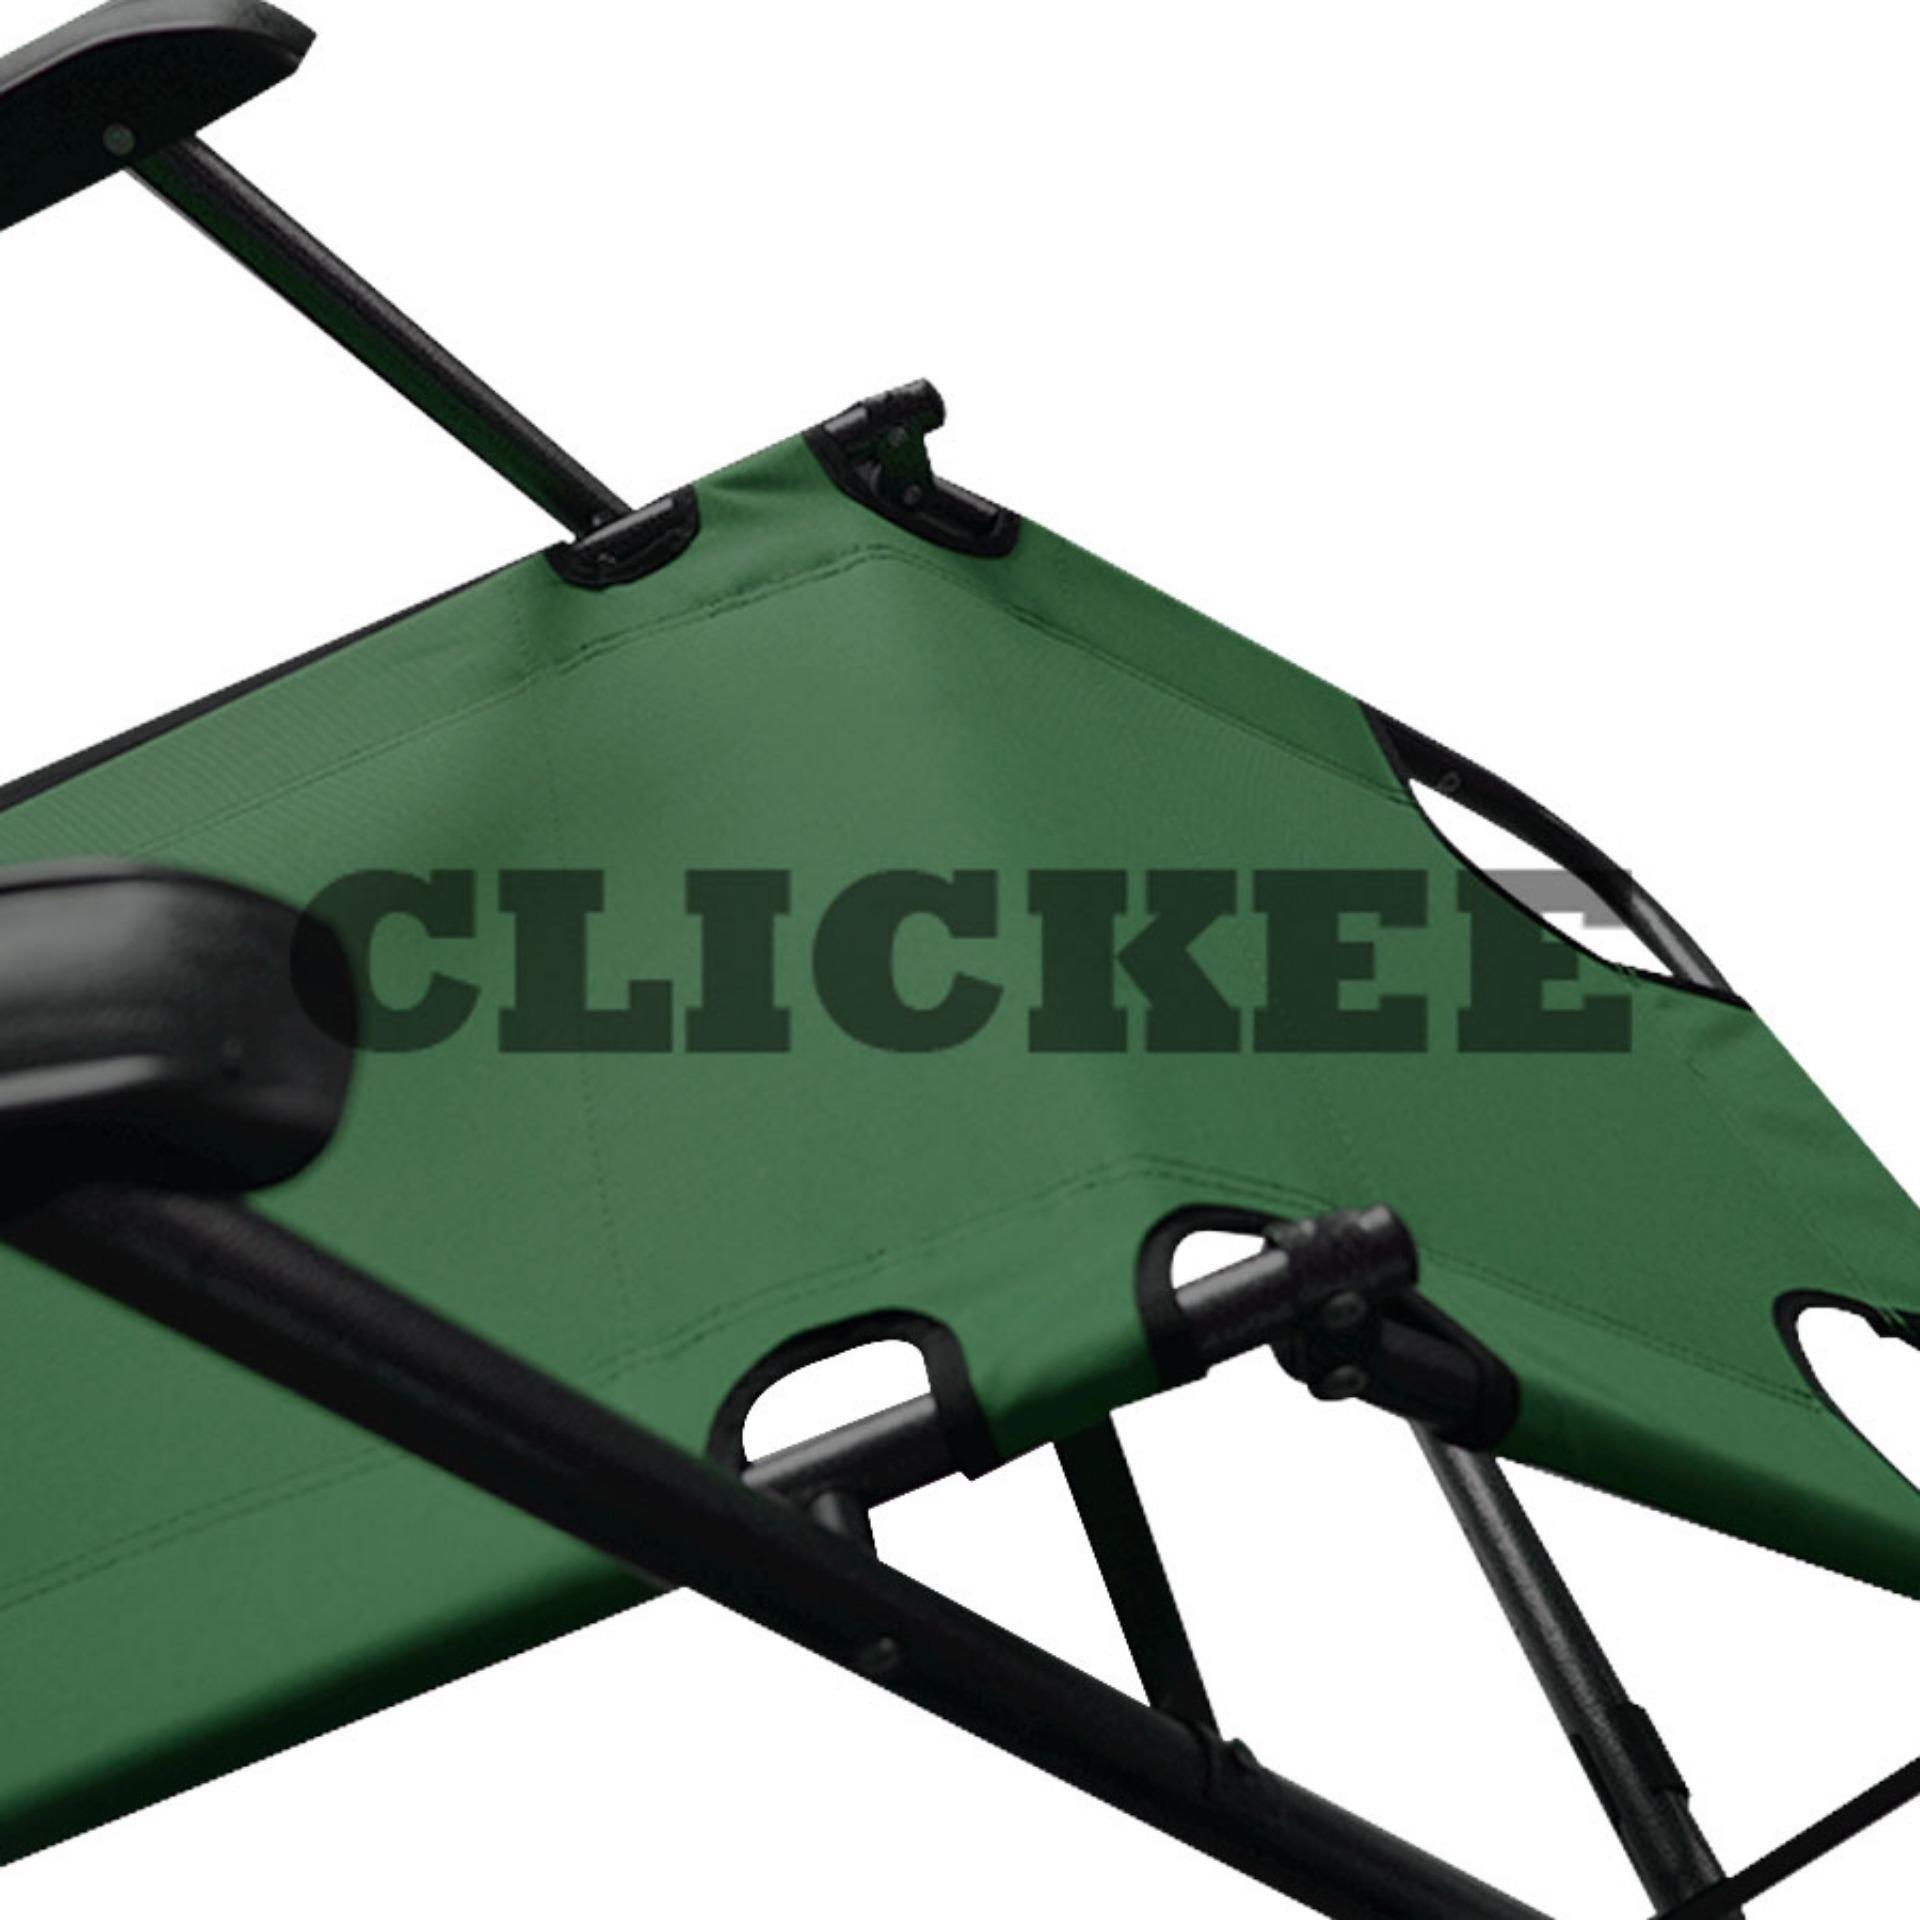 ... Hansen Best Quality Portable Strong Folding Camping Picnic OutdoorBeach Garden Chair Lounge Chair (Green) ...